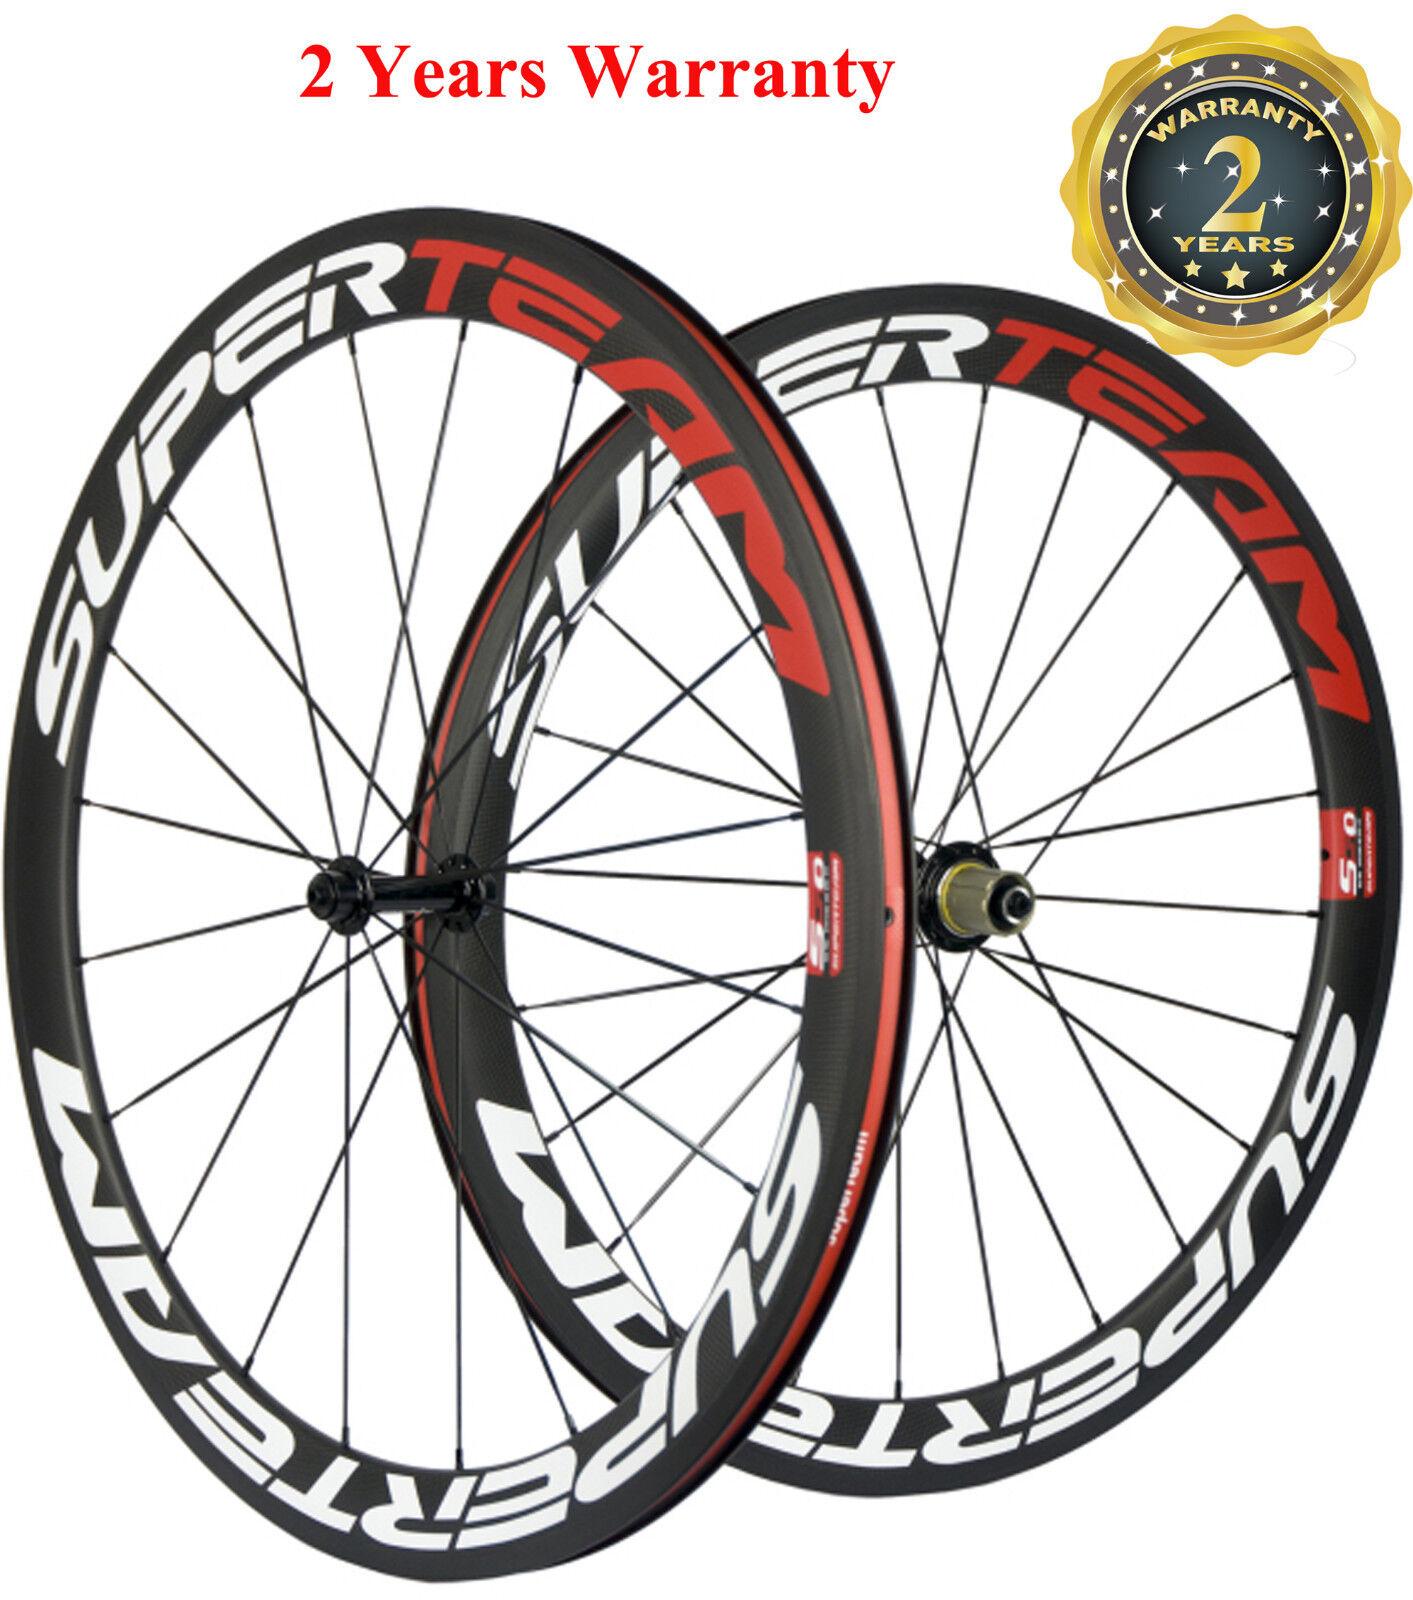 Superteam 700C  50mm Carbon Wheelset 25mm Width Roab Bike Wheels Cycling Wheelset  discount low price